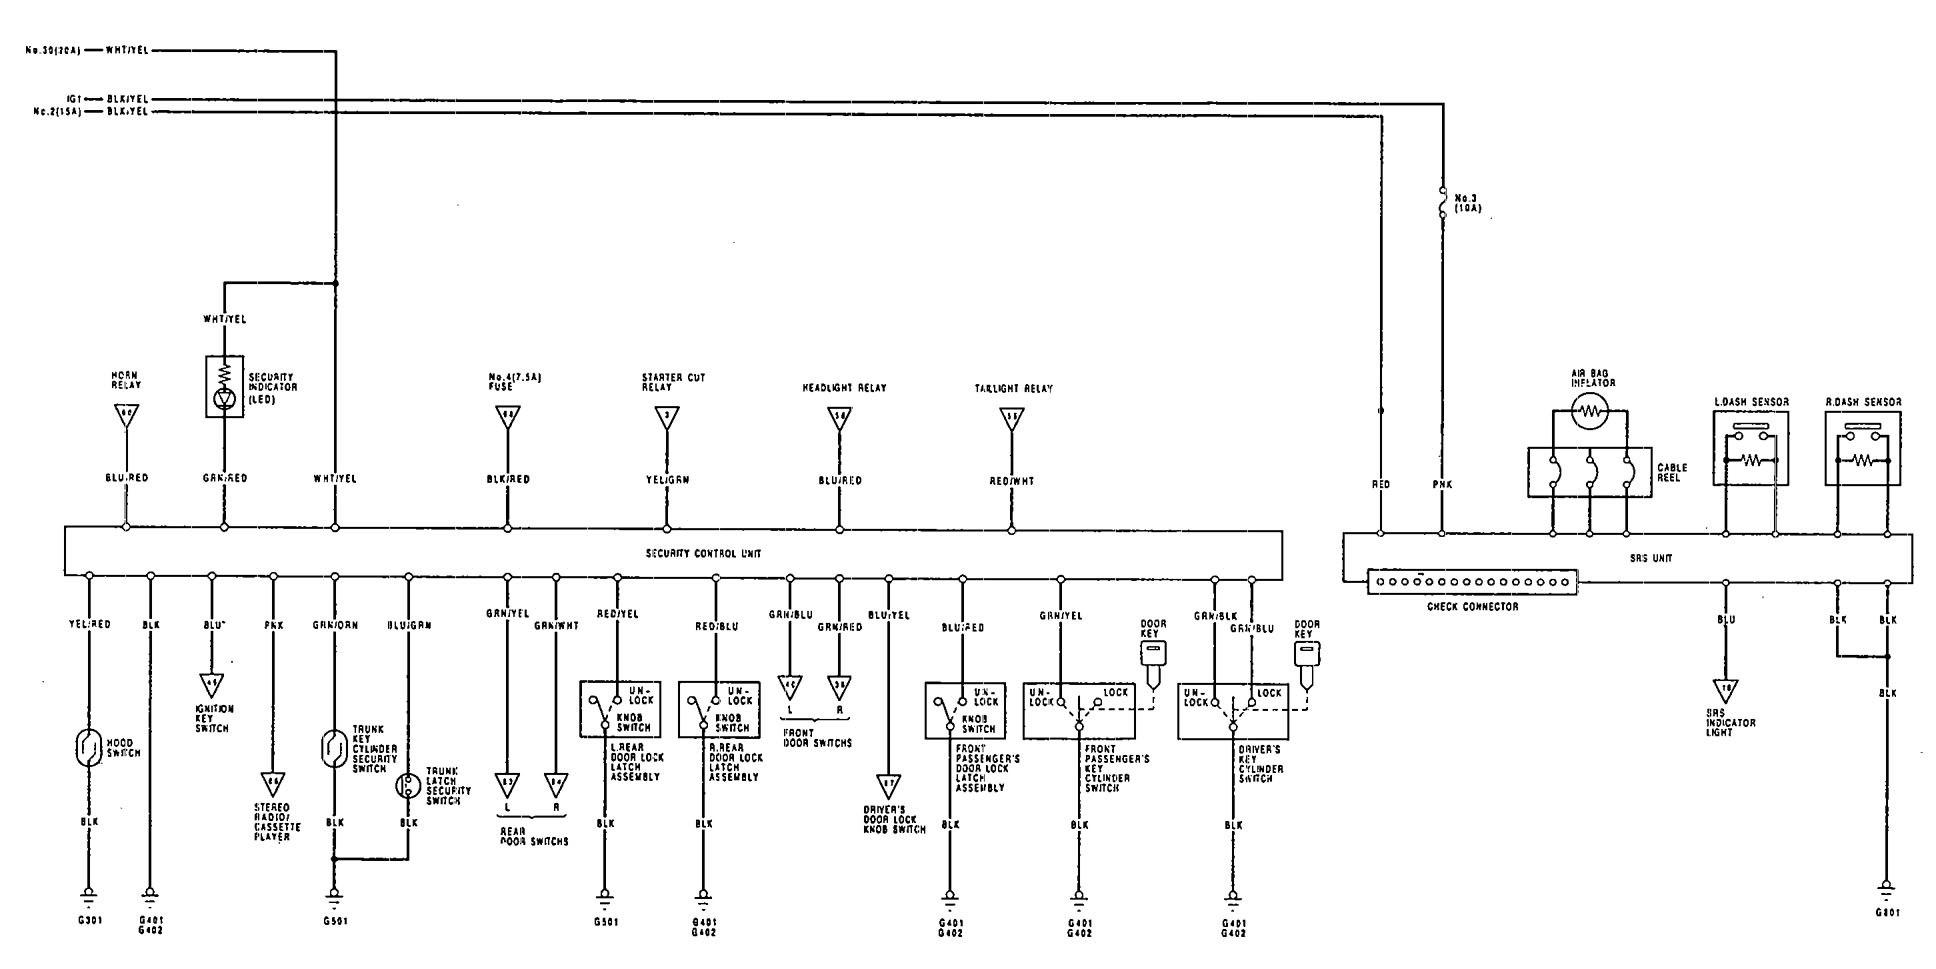 Acura Vigor  1992  - Wiring Diagrams